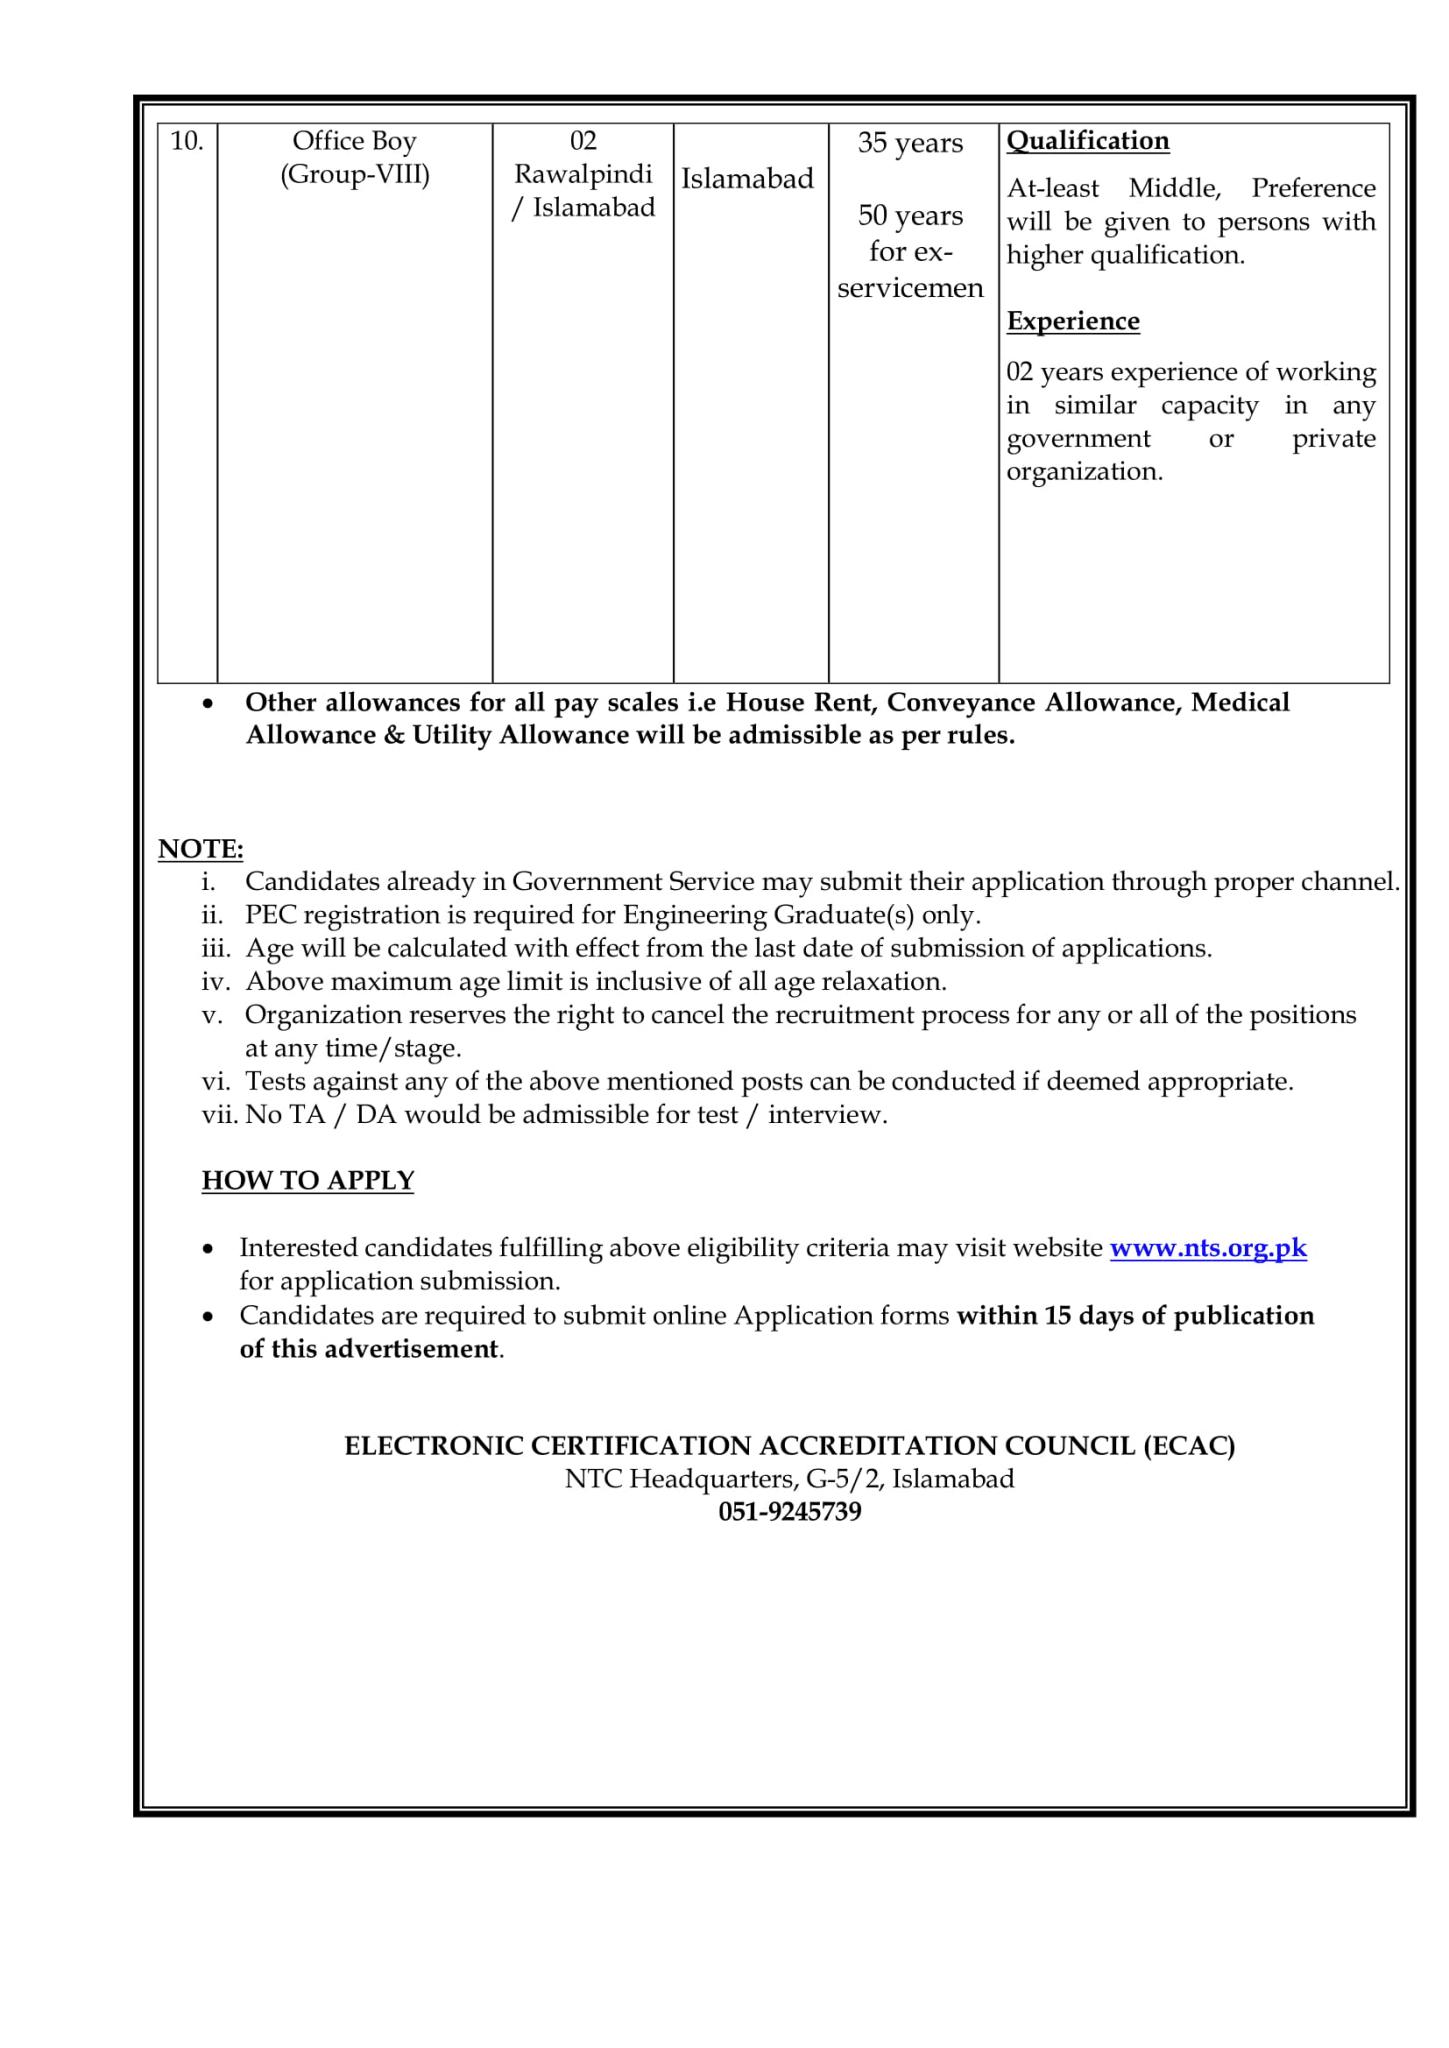 Electronic Certification Accreditation Council ECAC jobs